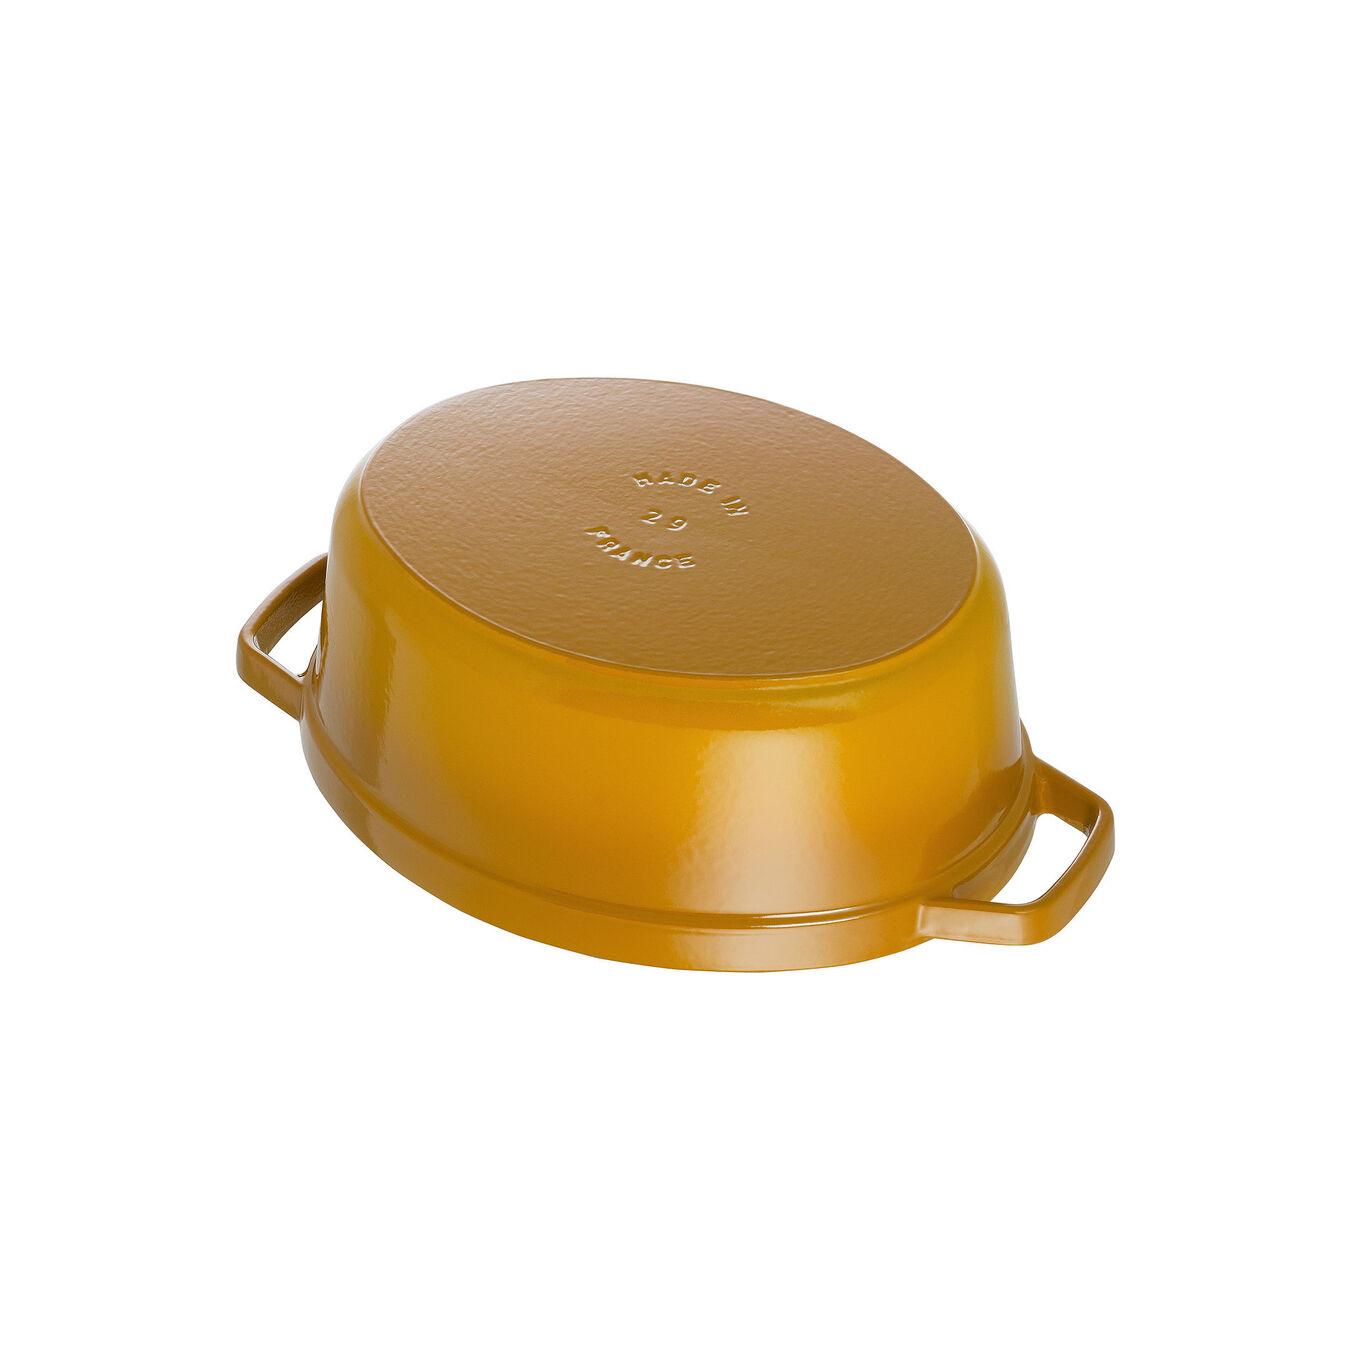 Cocotte 31 cm, Ovale, Moutarde, Fonte,,large 4